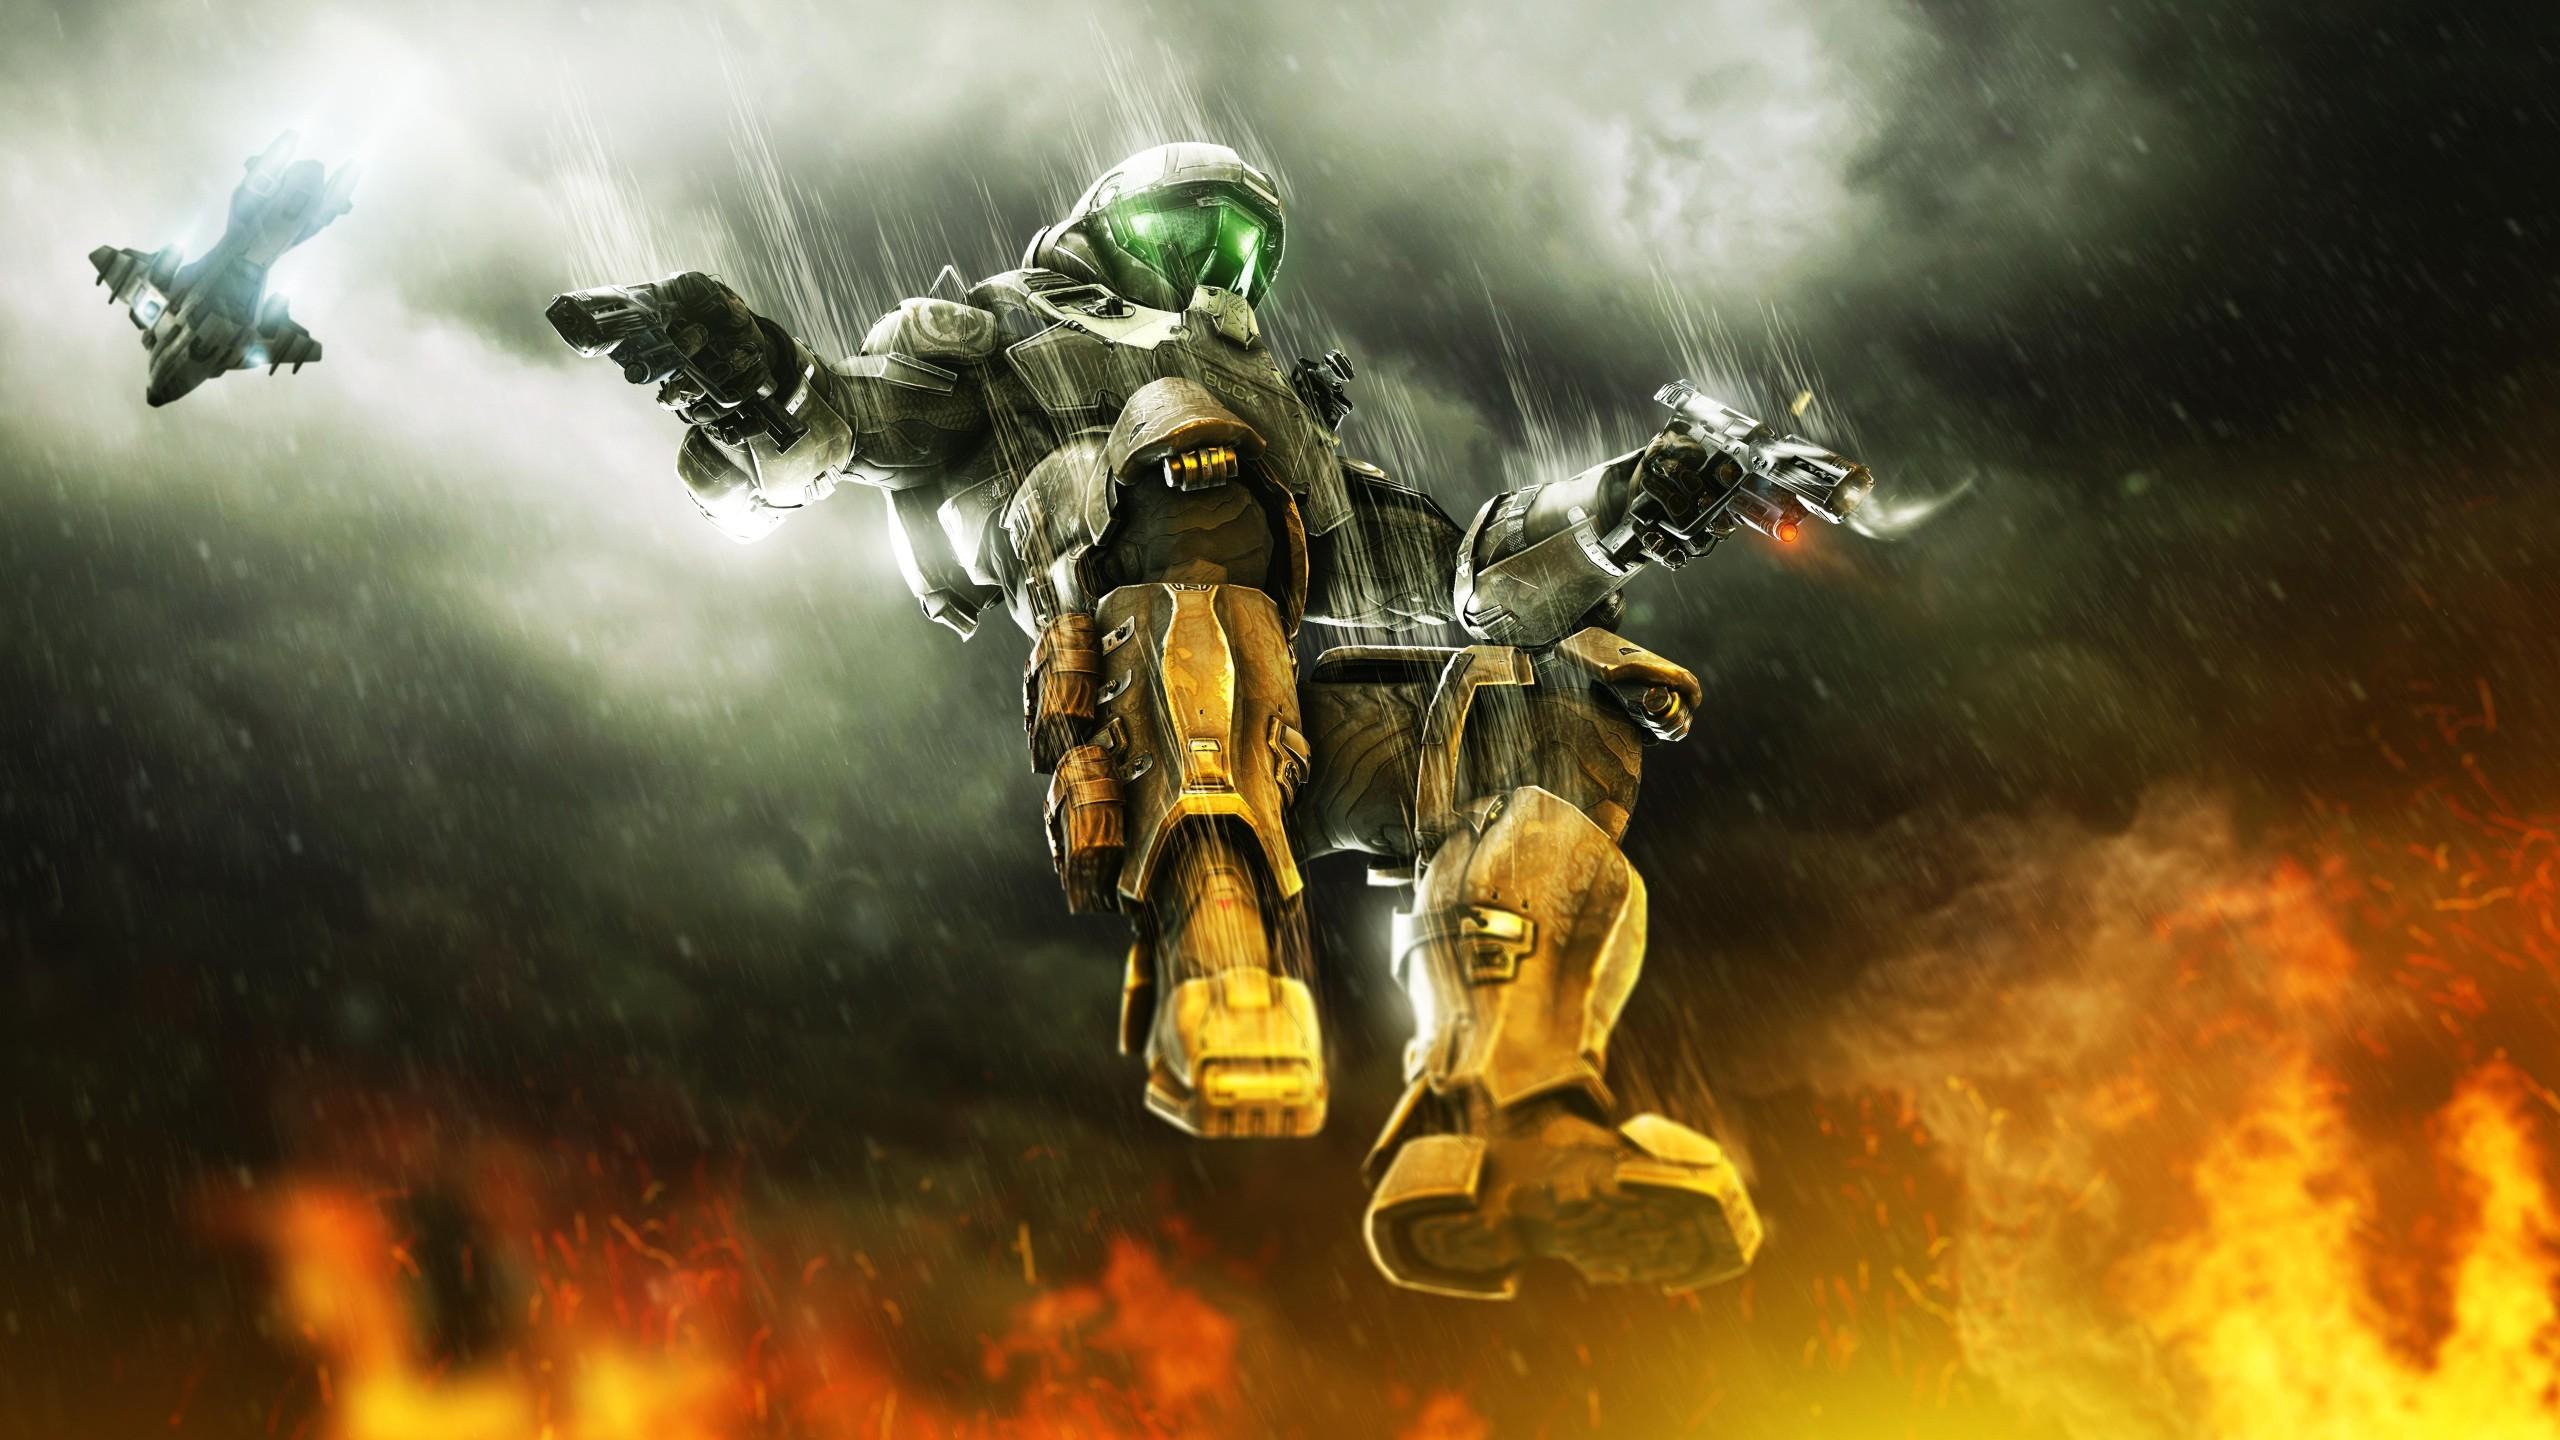 Halo 3 OSDT Artwork 4K 8K Wallpapers   HD Wallpapers